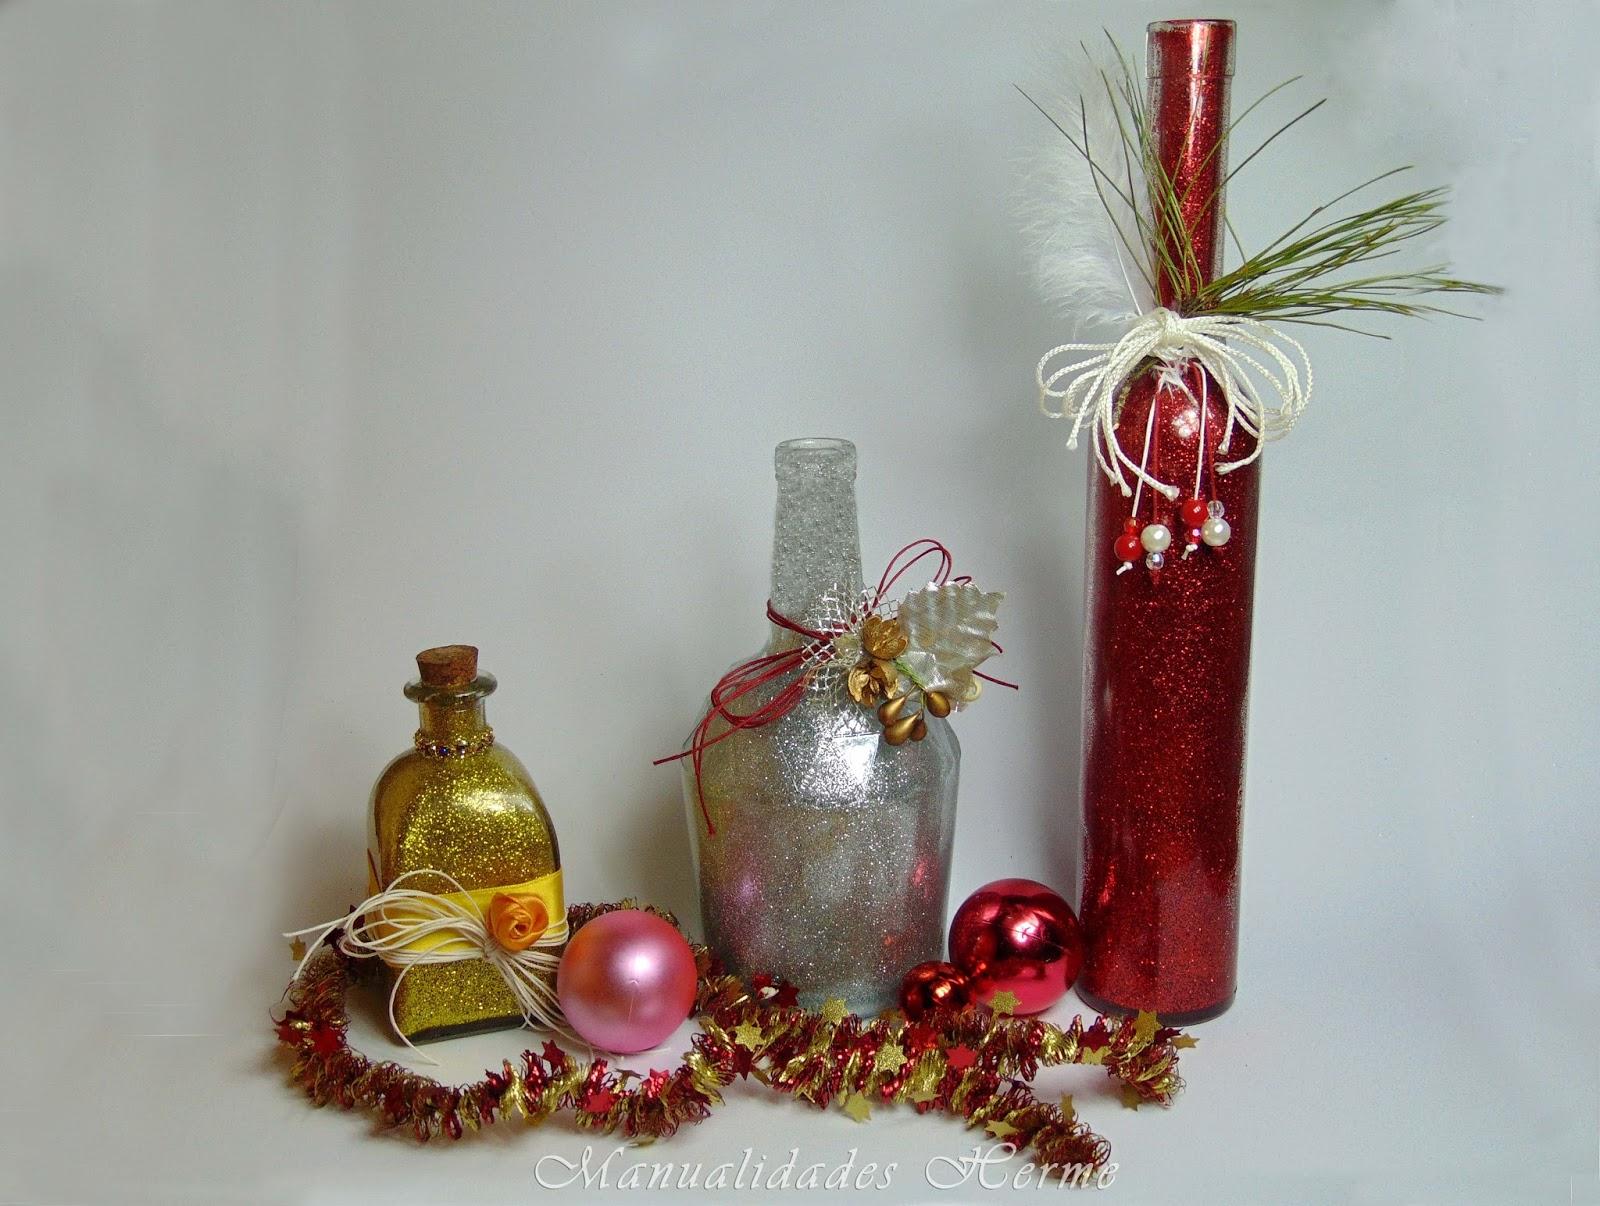 Manualidades herme diy botella decorada para navidad - Para navidad manualidades ...